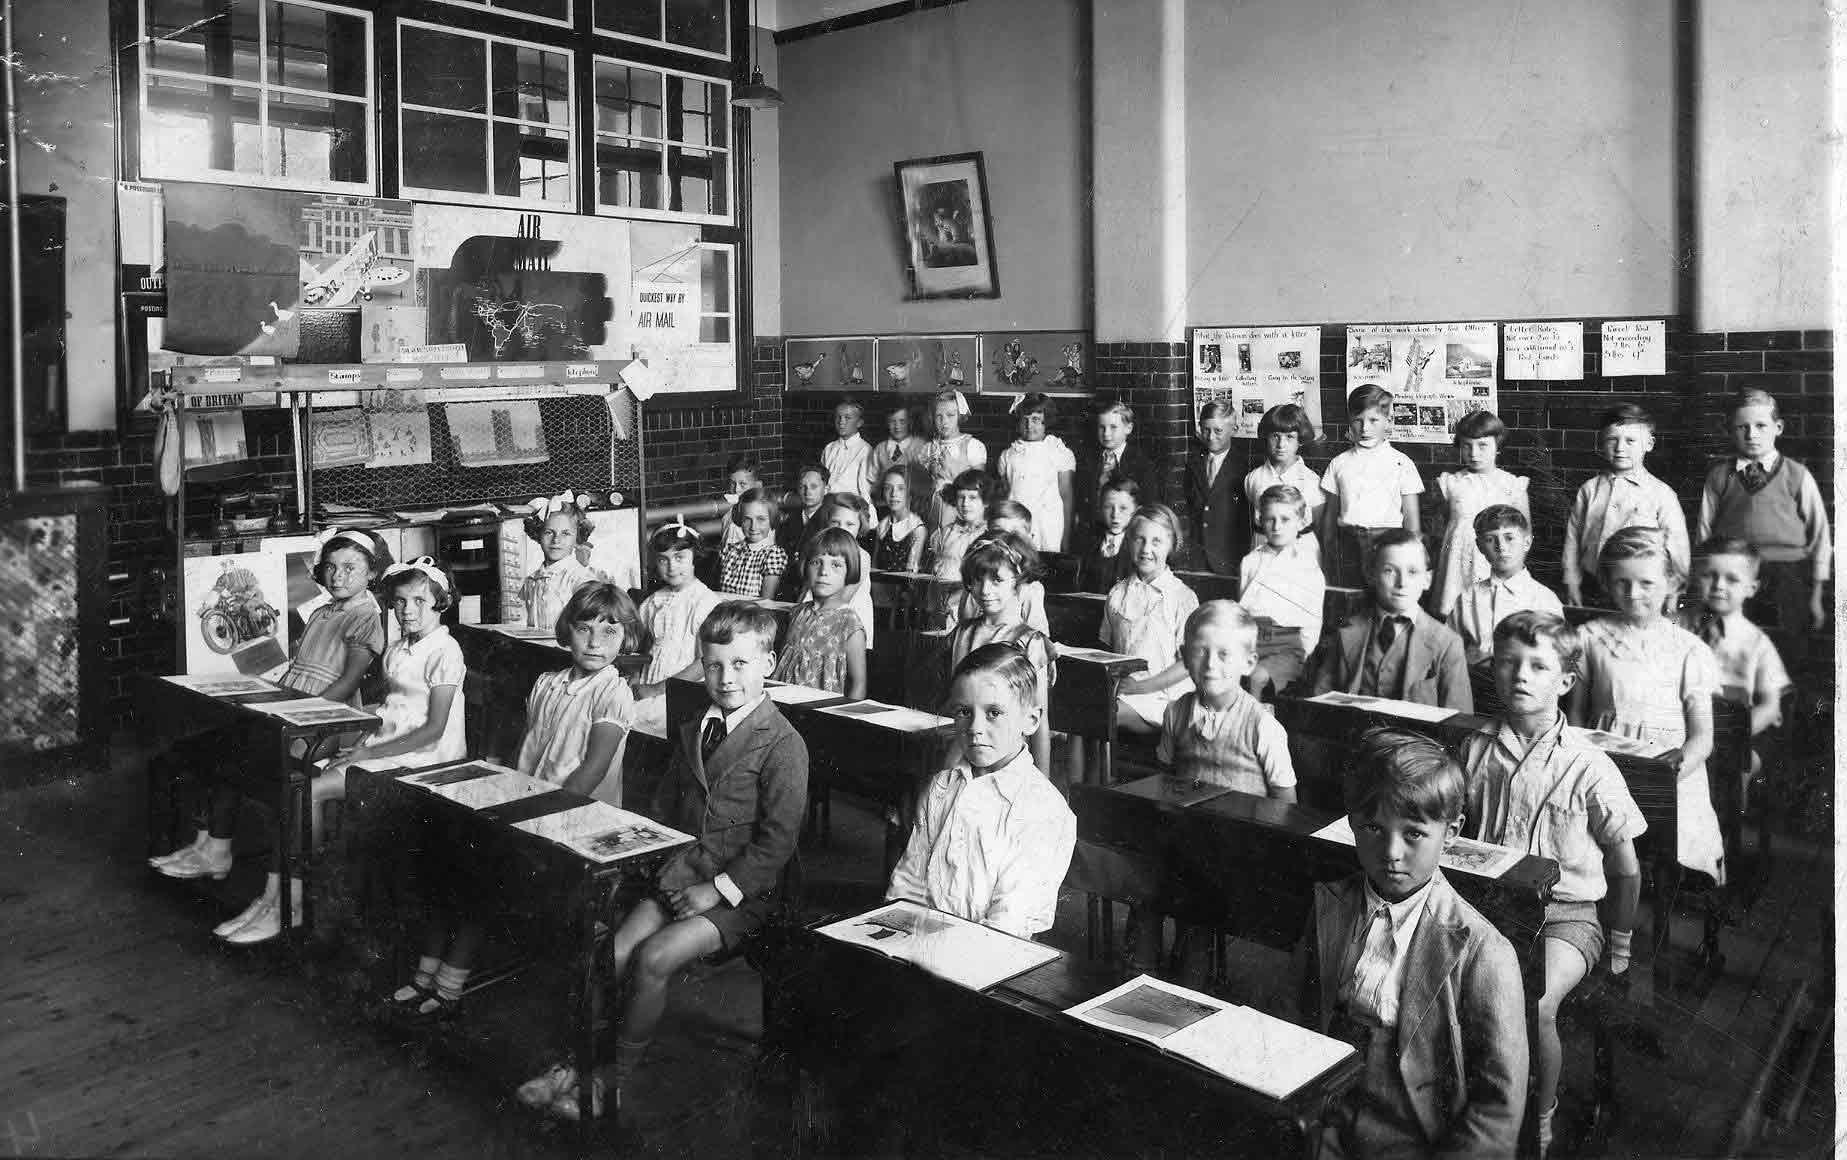 raked-classroom1937.jpg